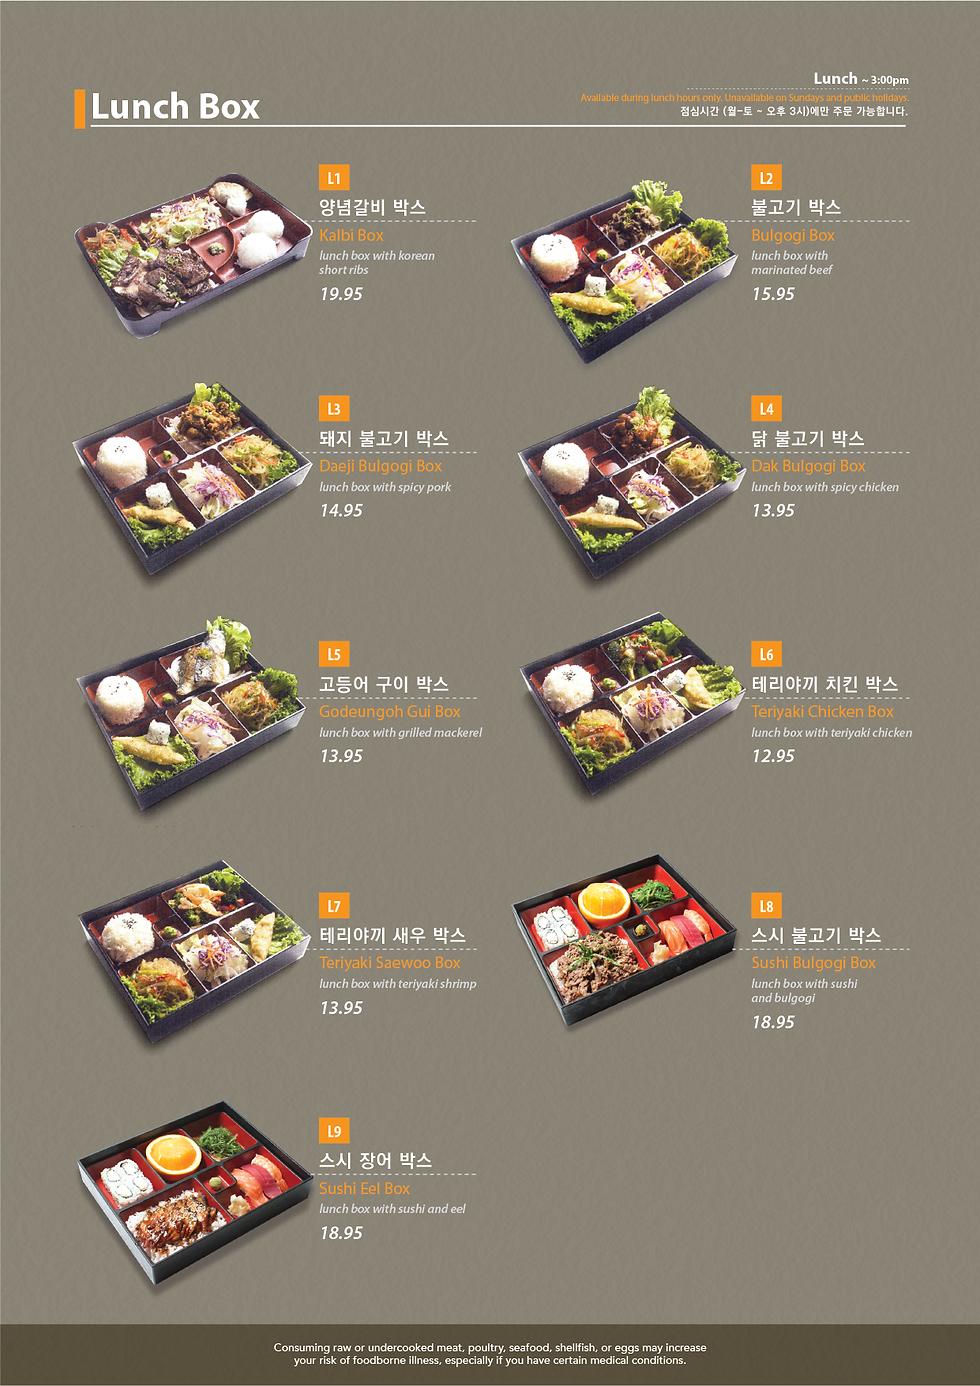 Sura-menu-8.27(W)X11.69(H)-final-093021-09.png